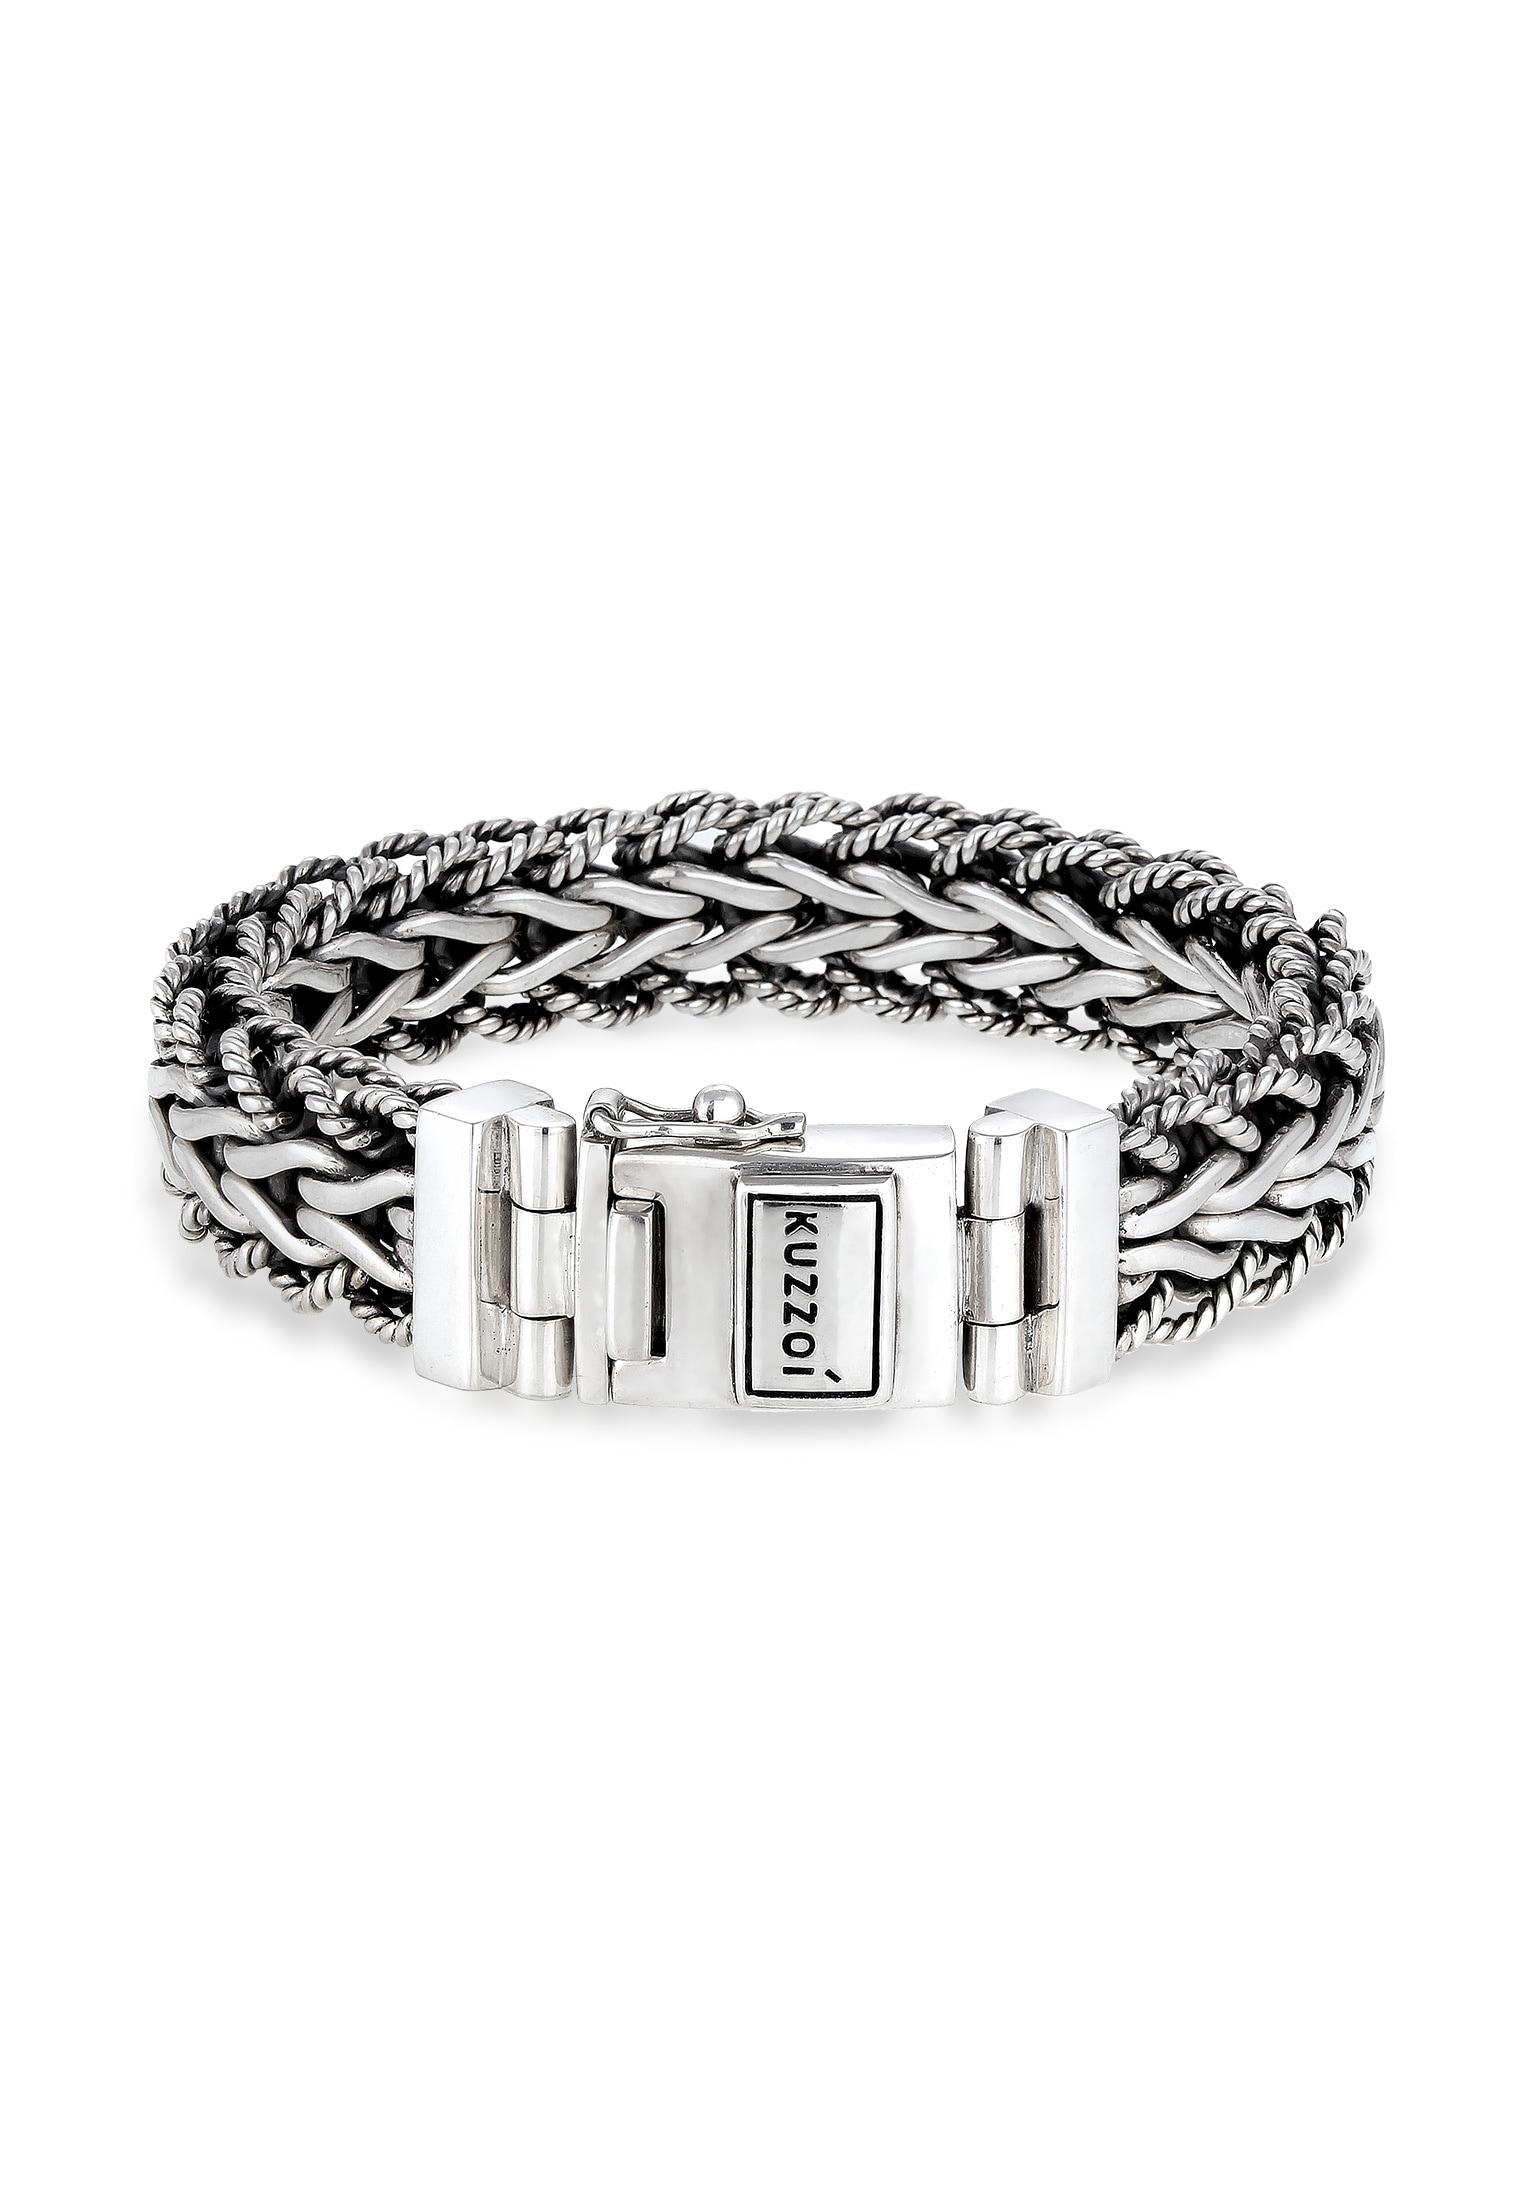 kuzzoi -  Armband Herren Panzerarmband Gliederkette 925er Silber